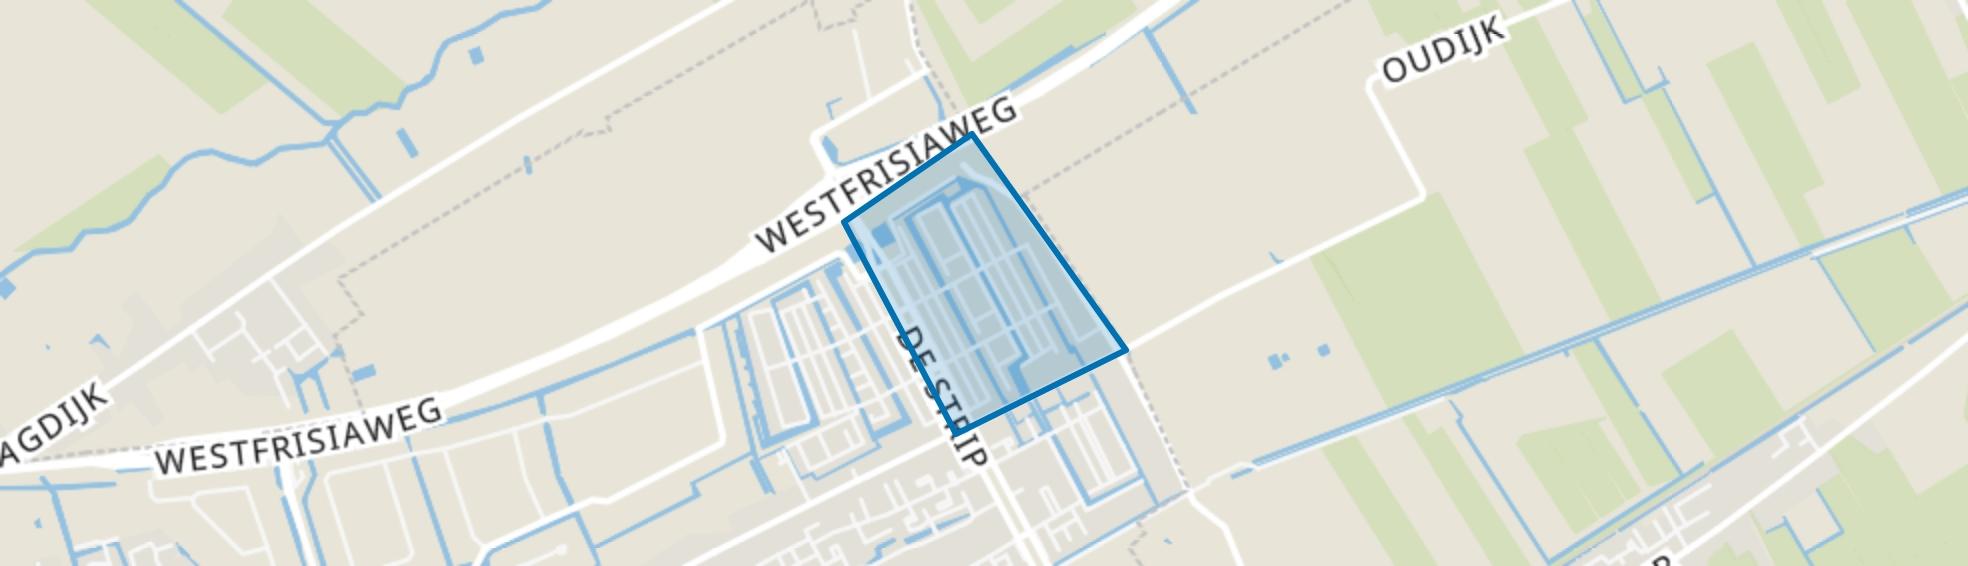 Bangert en Oosterpolder - Buurt 35 02, Zwaag map